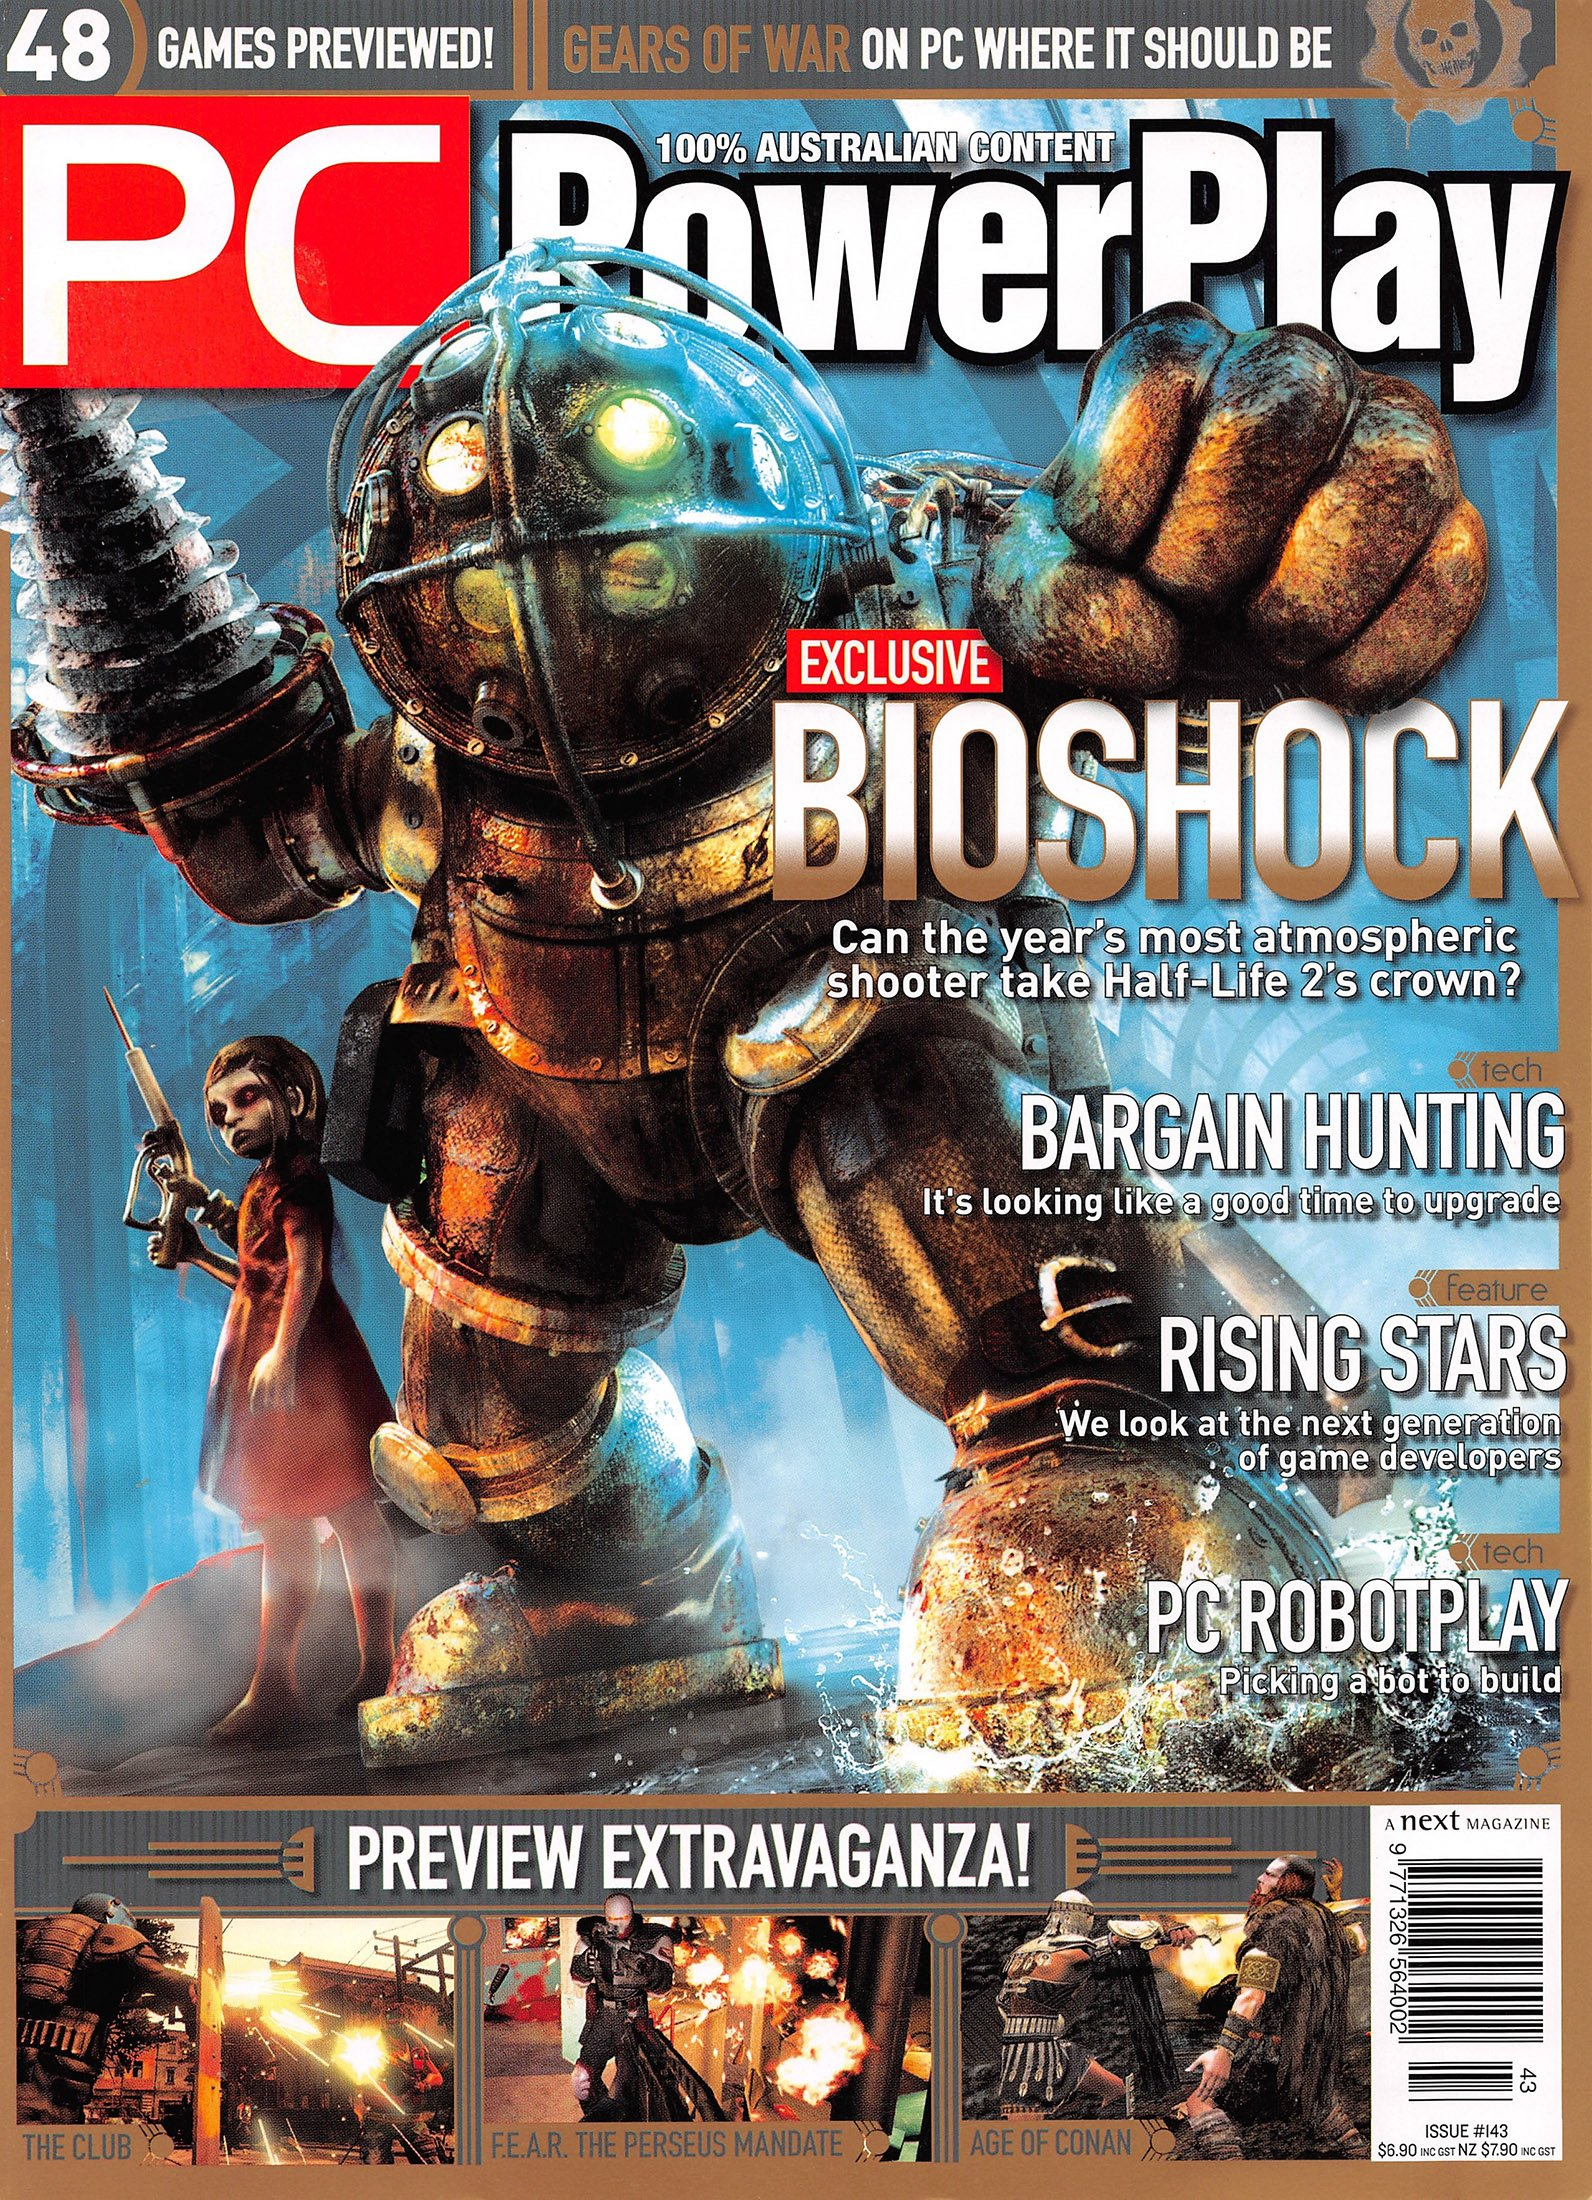 PC PowerPlay 143 (October 2007)